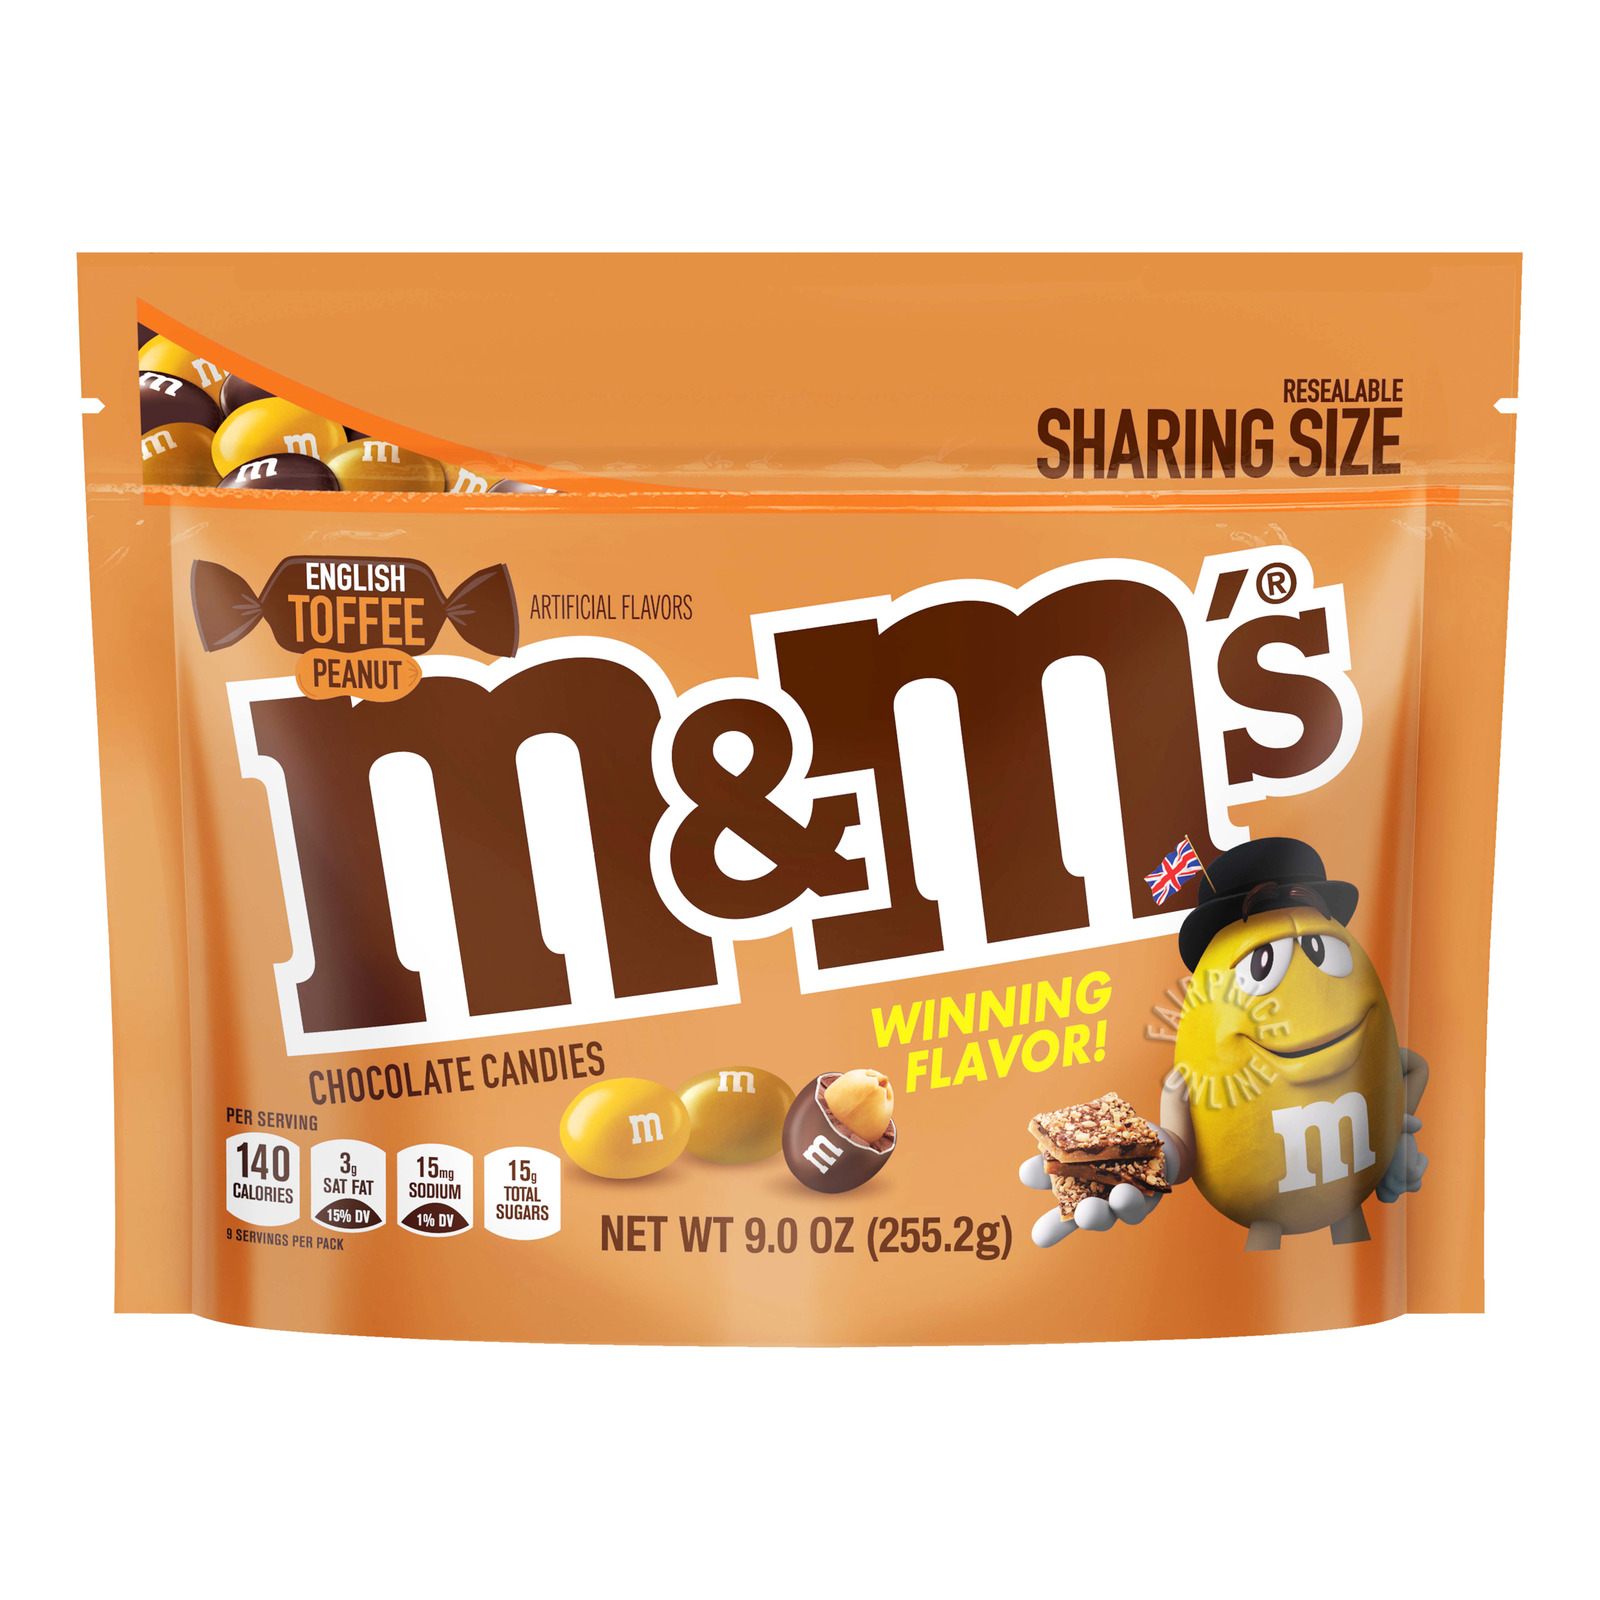 M&M's Chocolate Candies - English Toffee Peanut